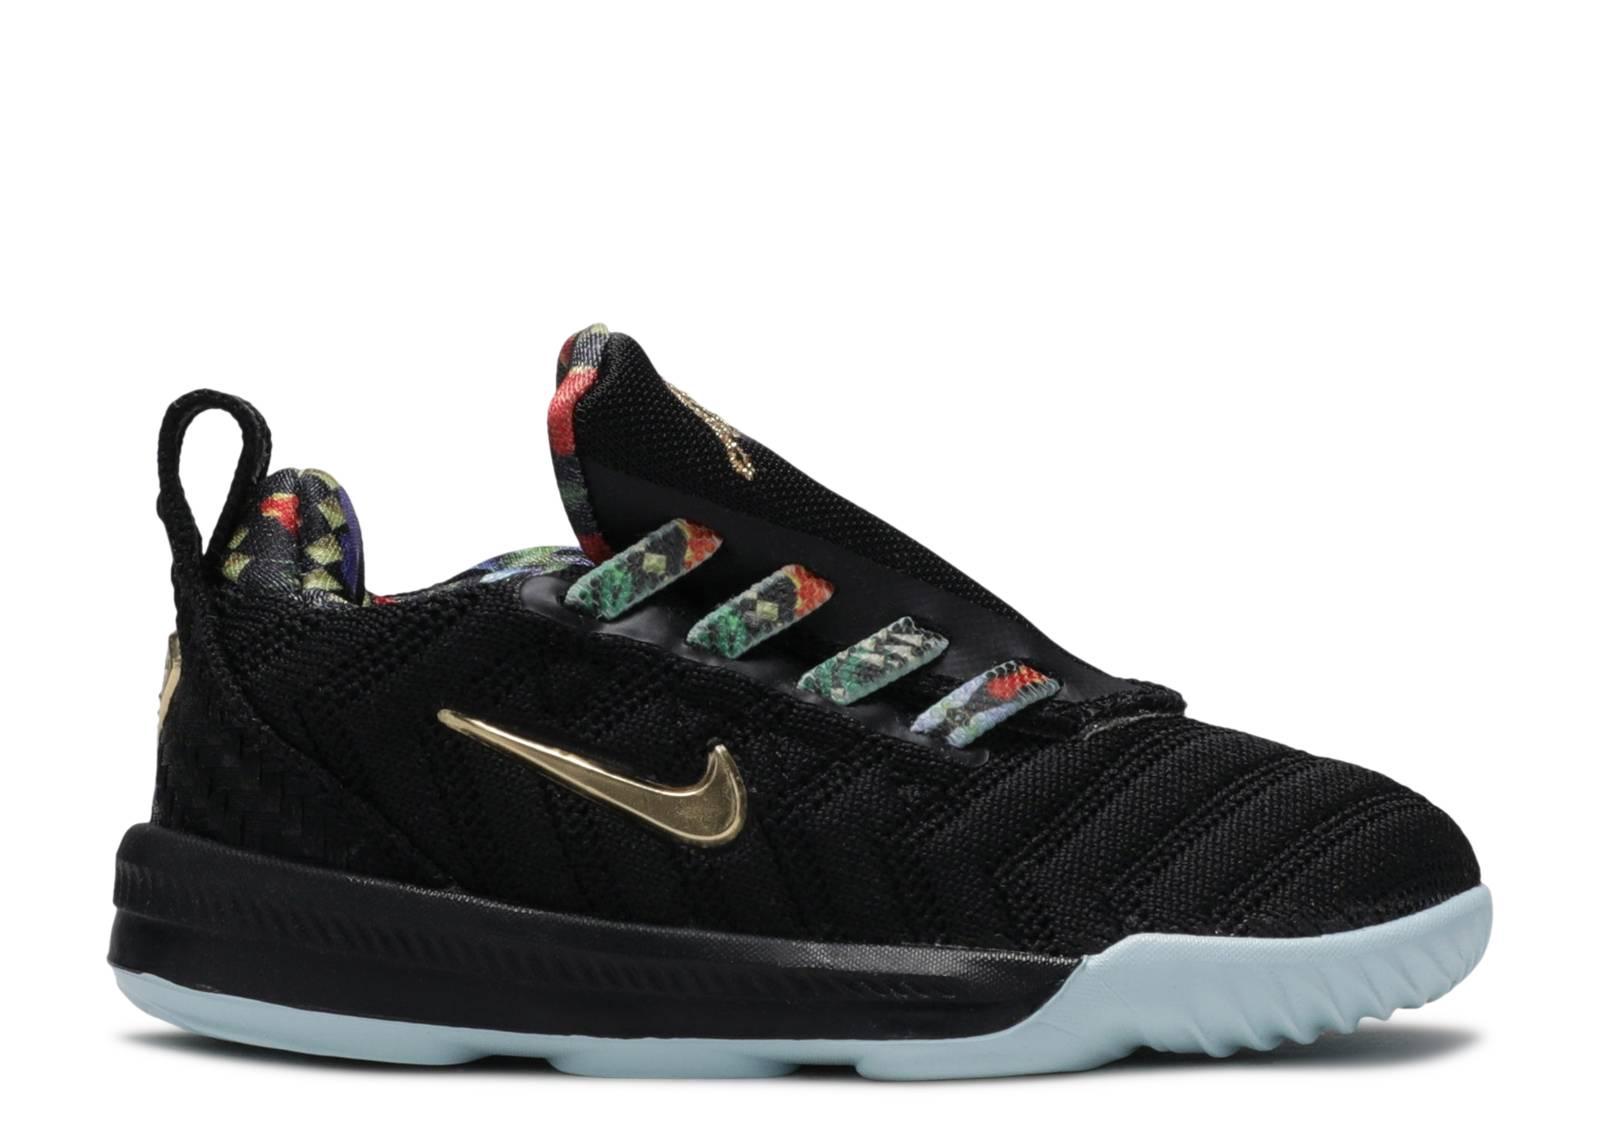 758fd7063f5 Nike LeBron 16 KC